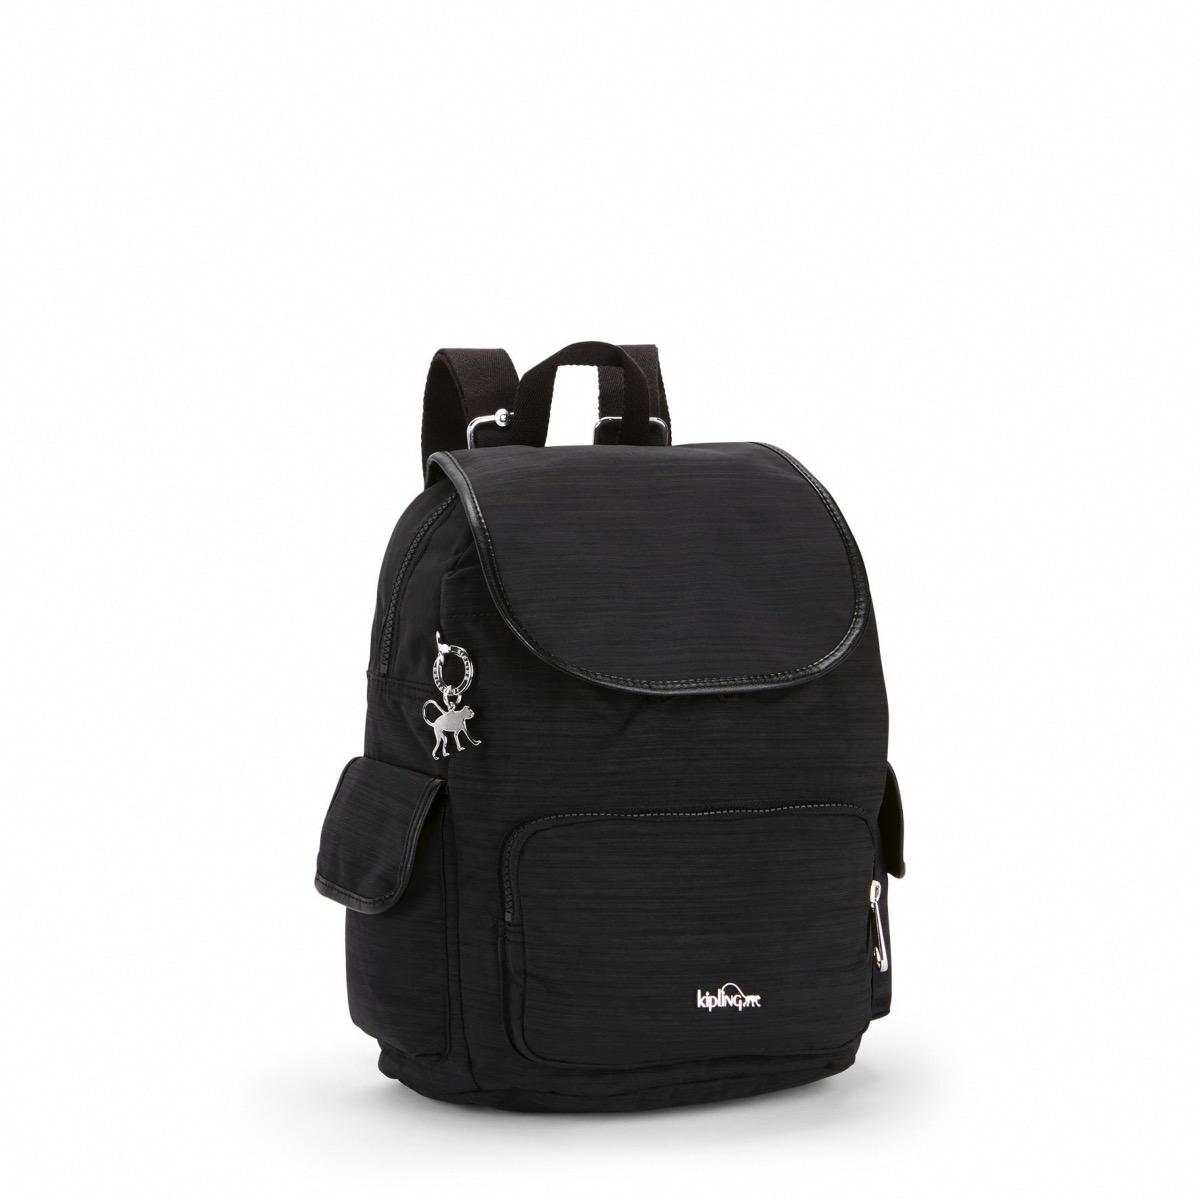 74a3da422c Kipling City Pack S Small Backpack